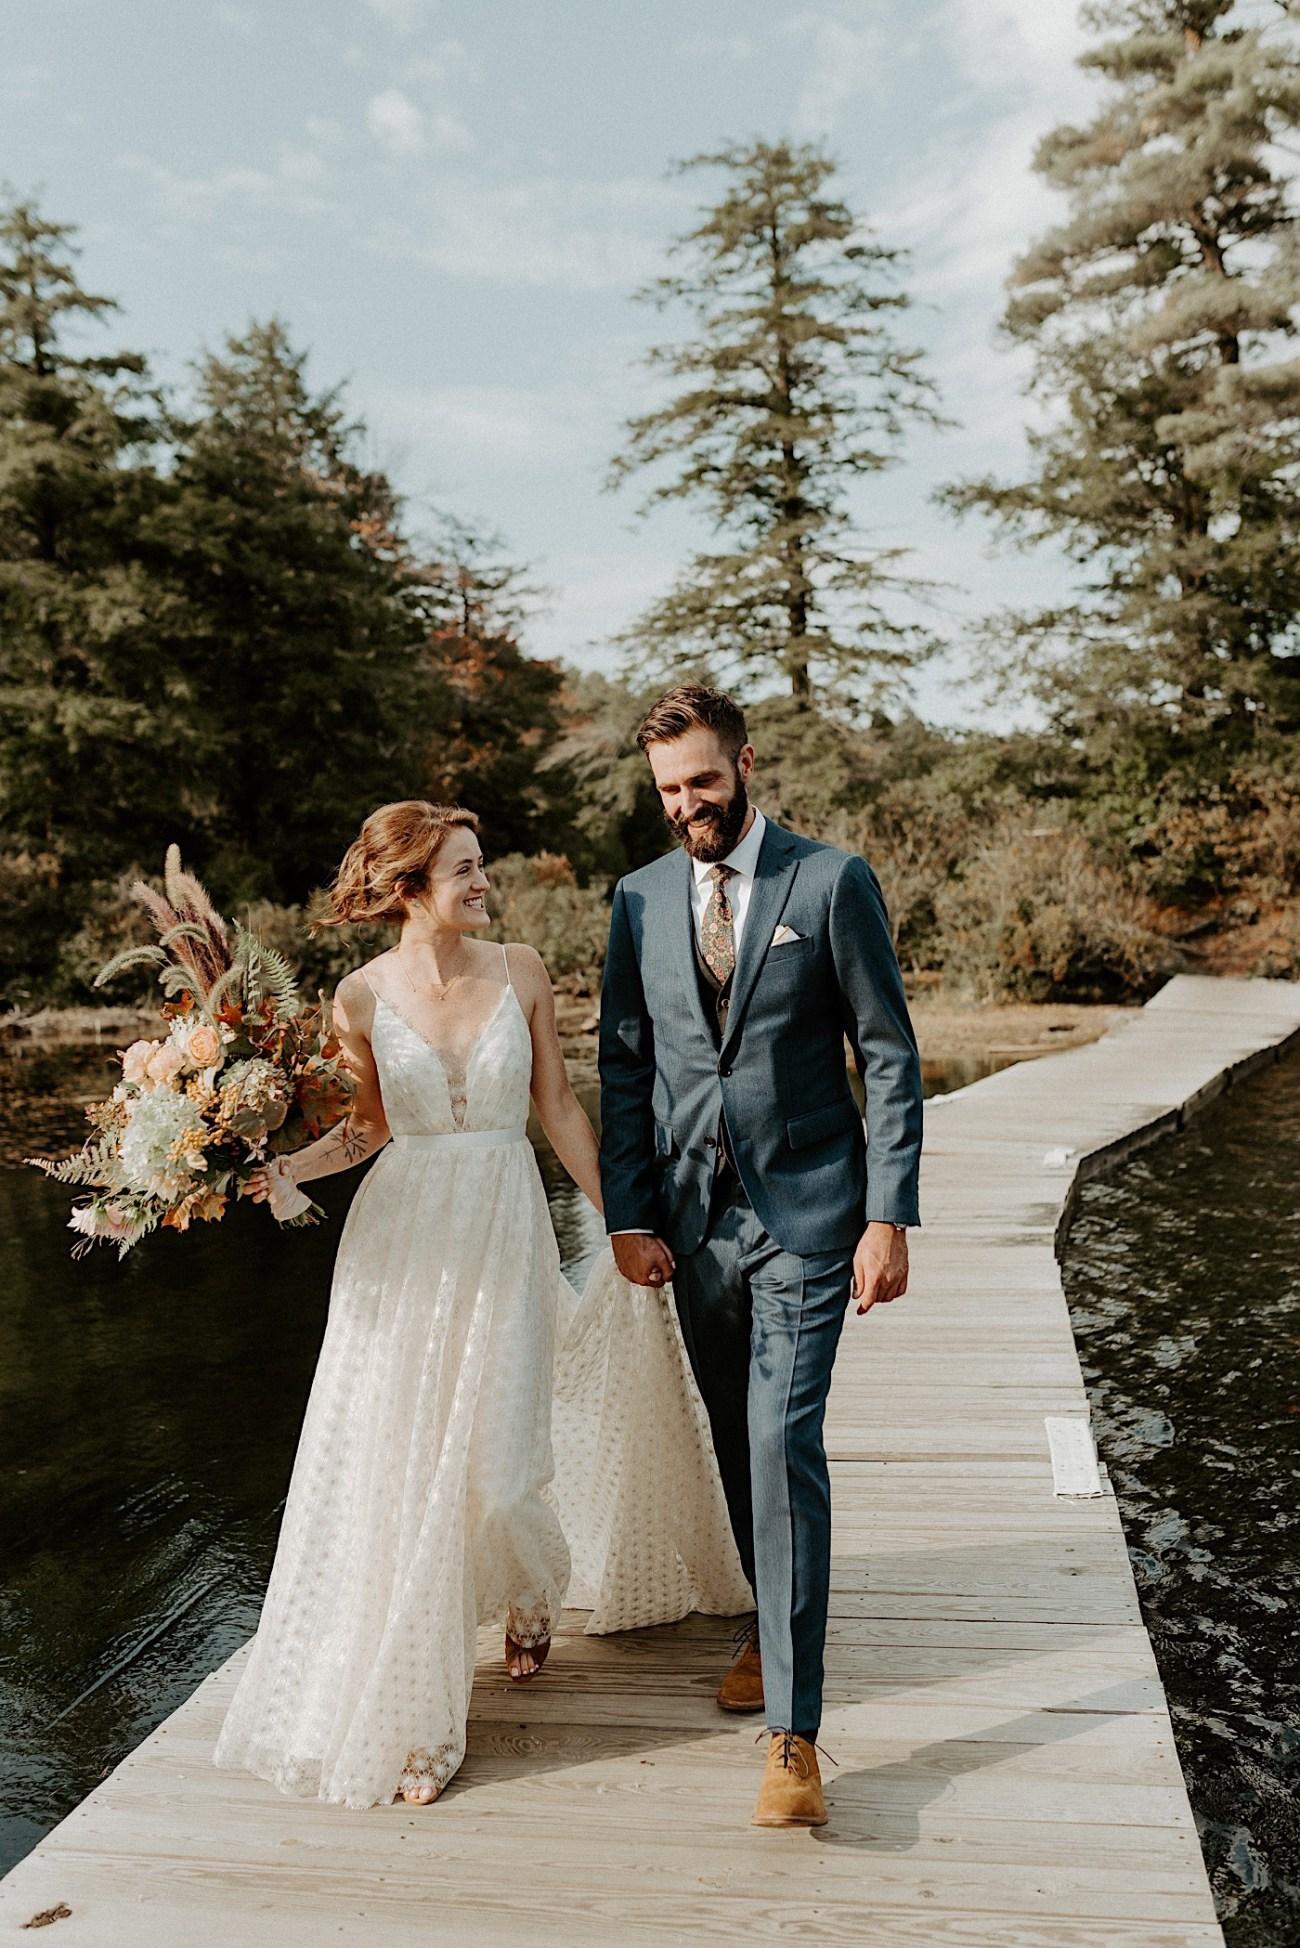 Destination Lakeside Wedding Mt Washington Wedding Outdoor Wedding Boston Wedding Photographer 042